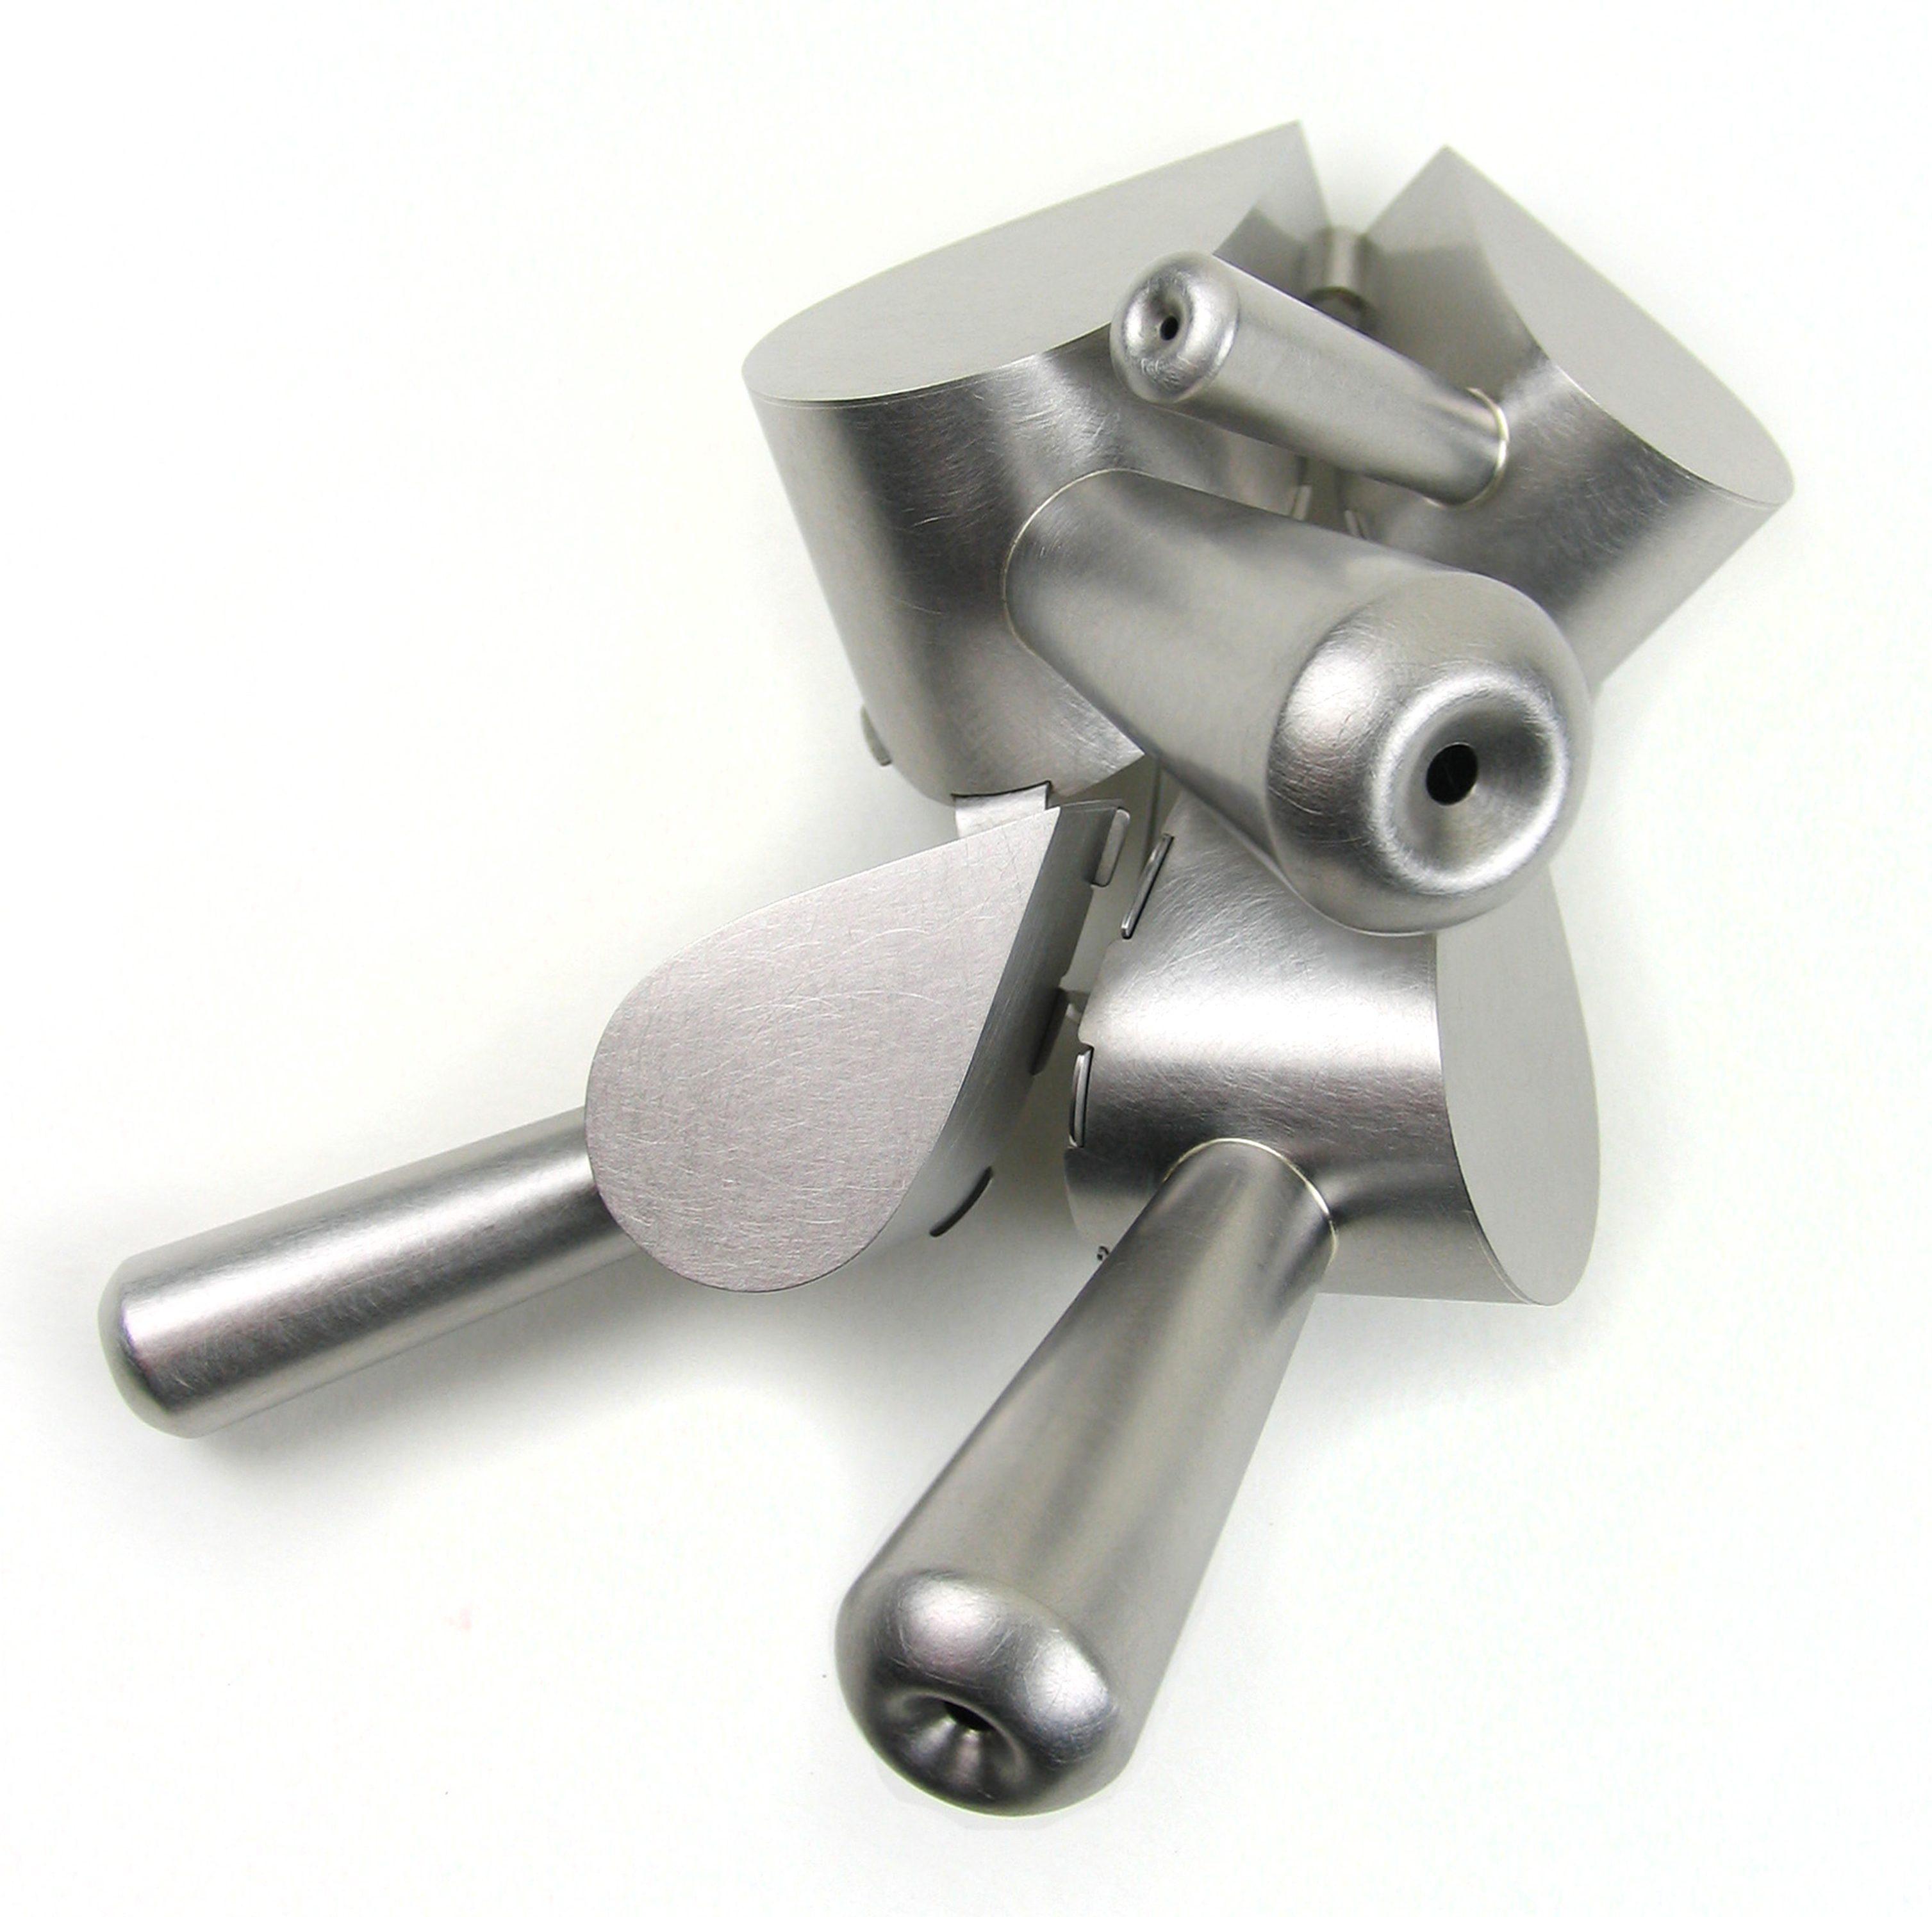 Simon Cottrell, Four Focused Barrelled Drops, broche, 2011, Monel 400, roestvrij staal